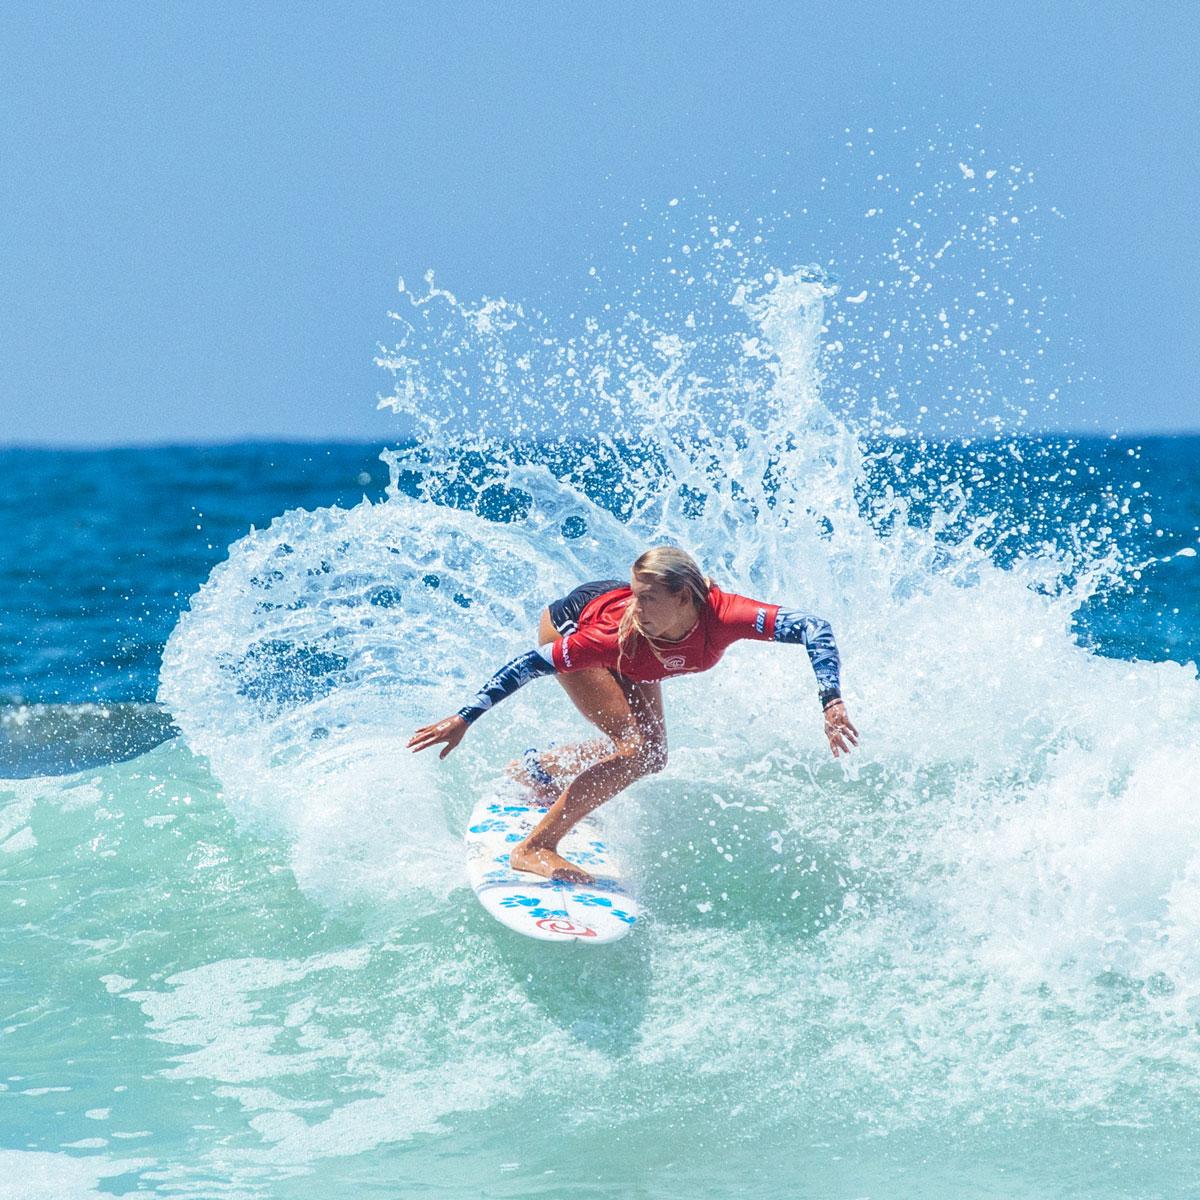 Female Surfer cutting wave